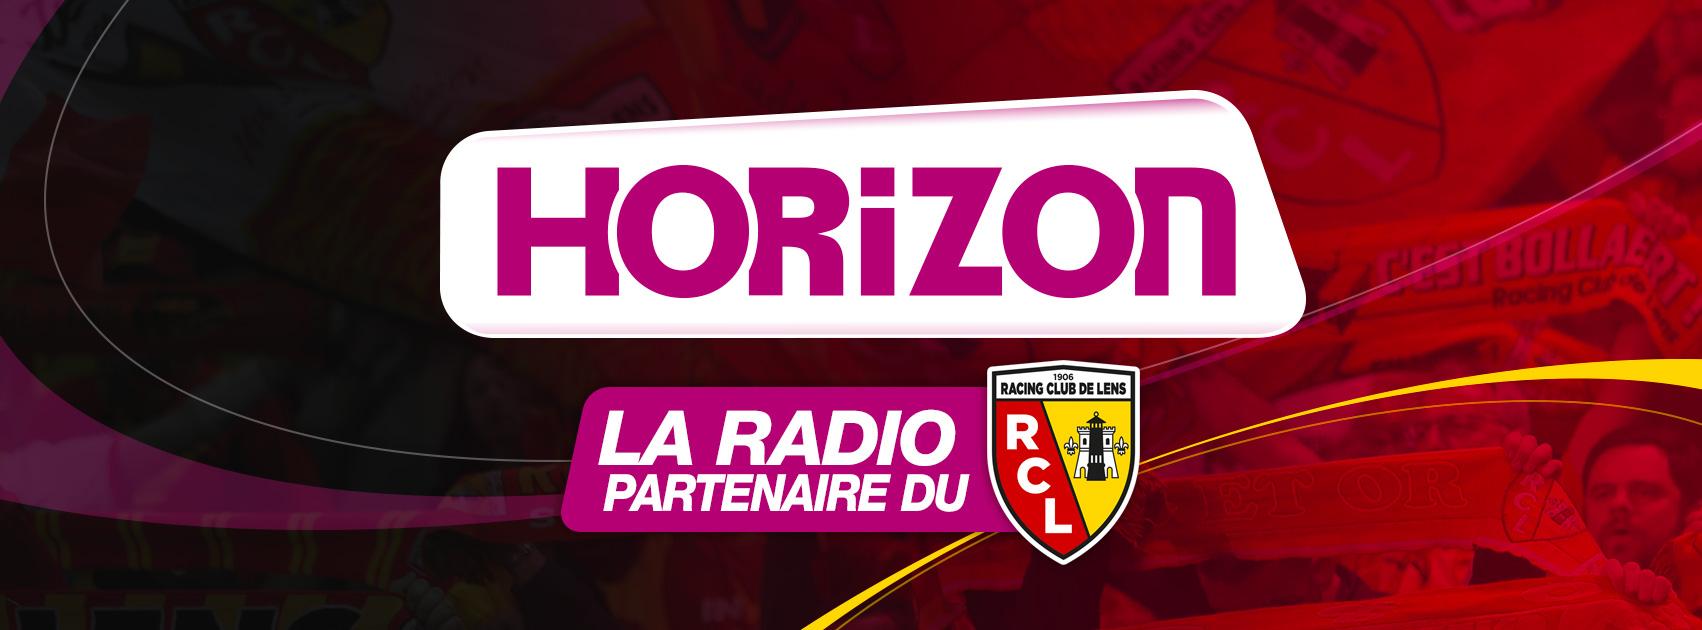 Horizon devient radio partenaire du RC Lens